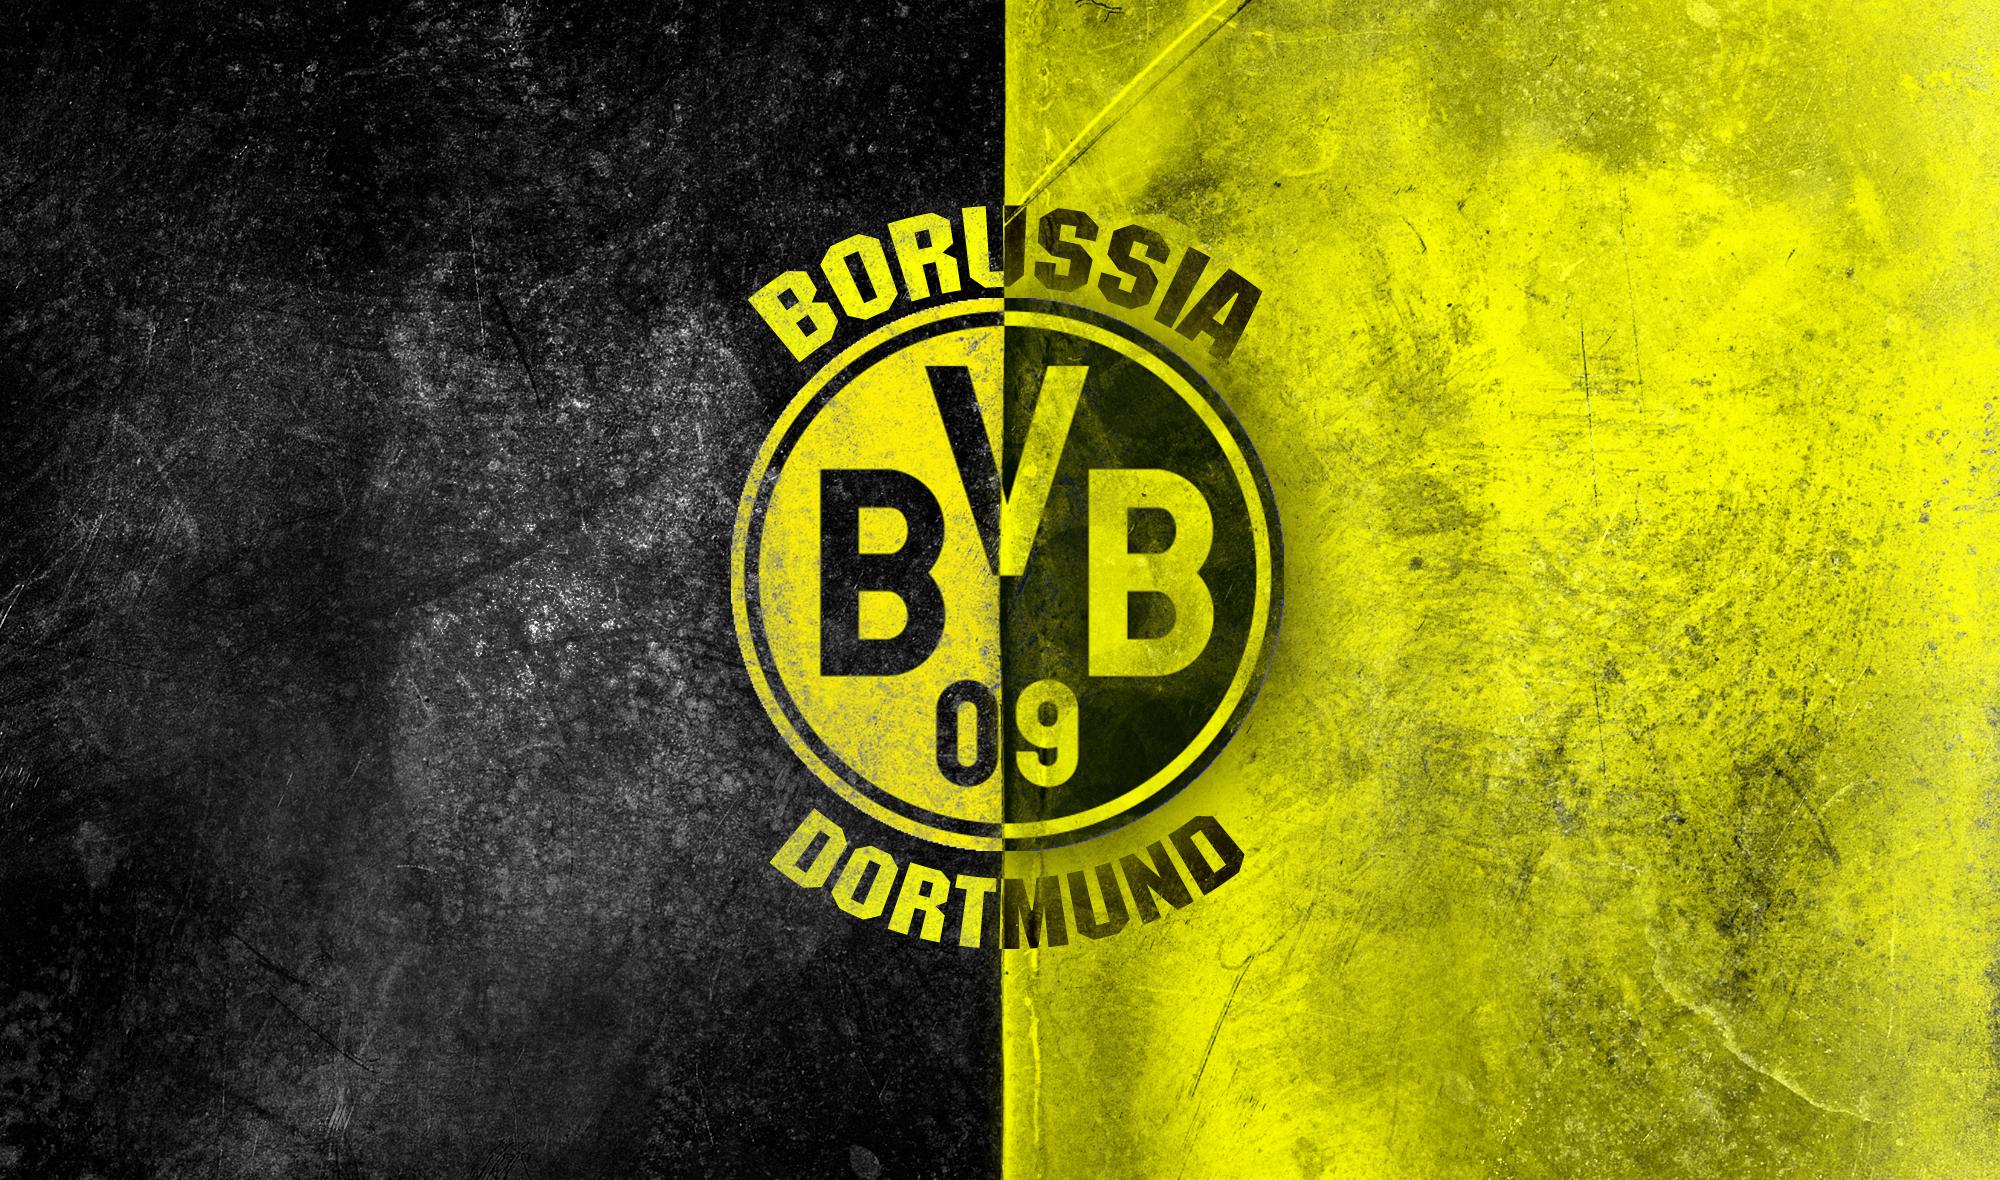 Borussia Dortmund Logo Wallpaper HD   Borussia Dortmund Logo 2000x1180